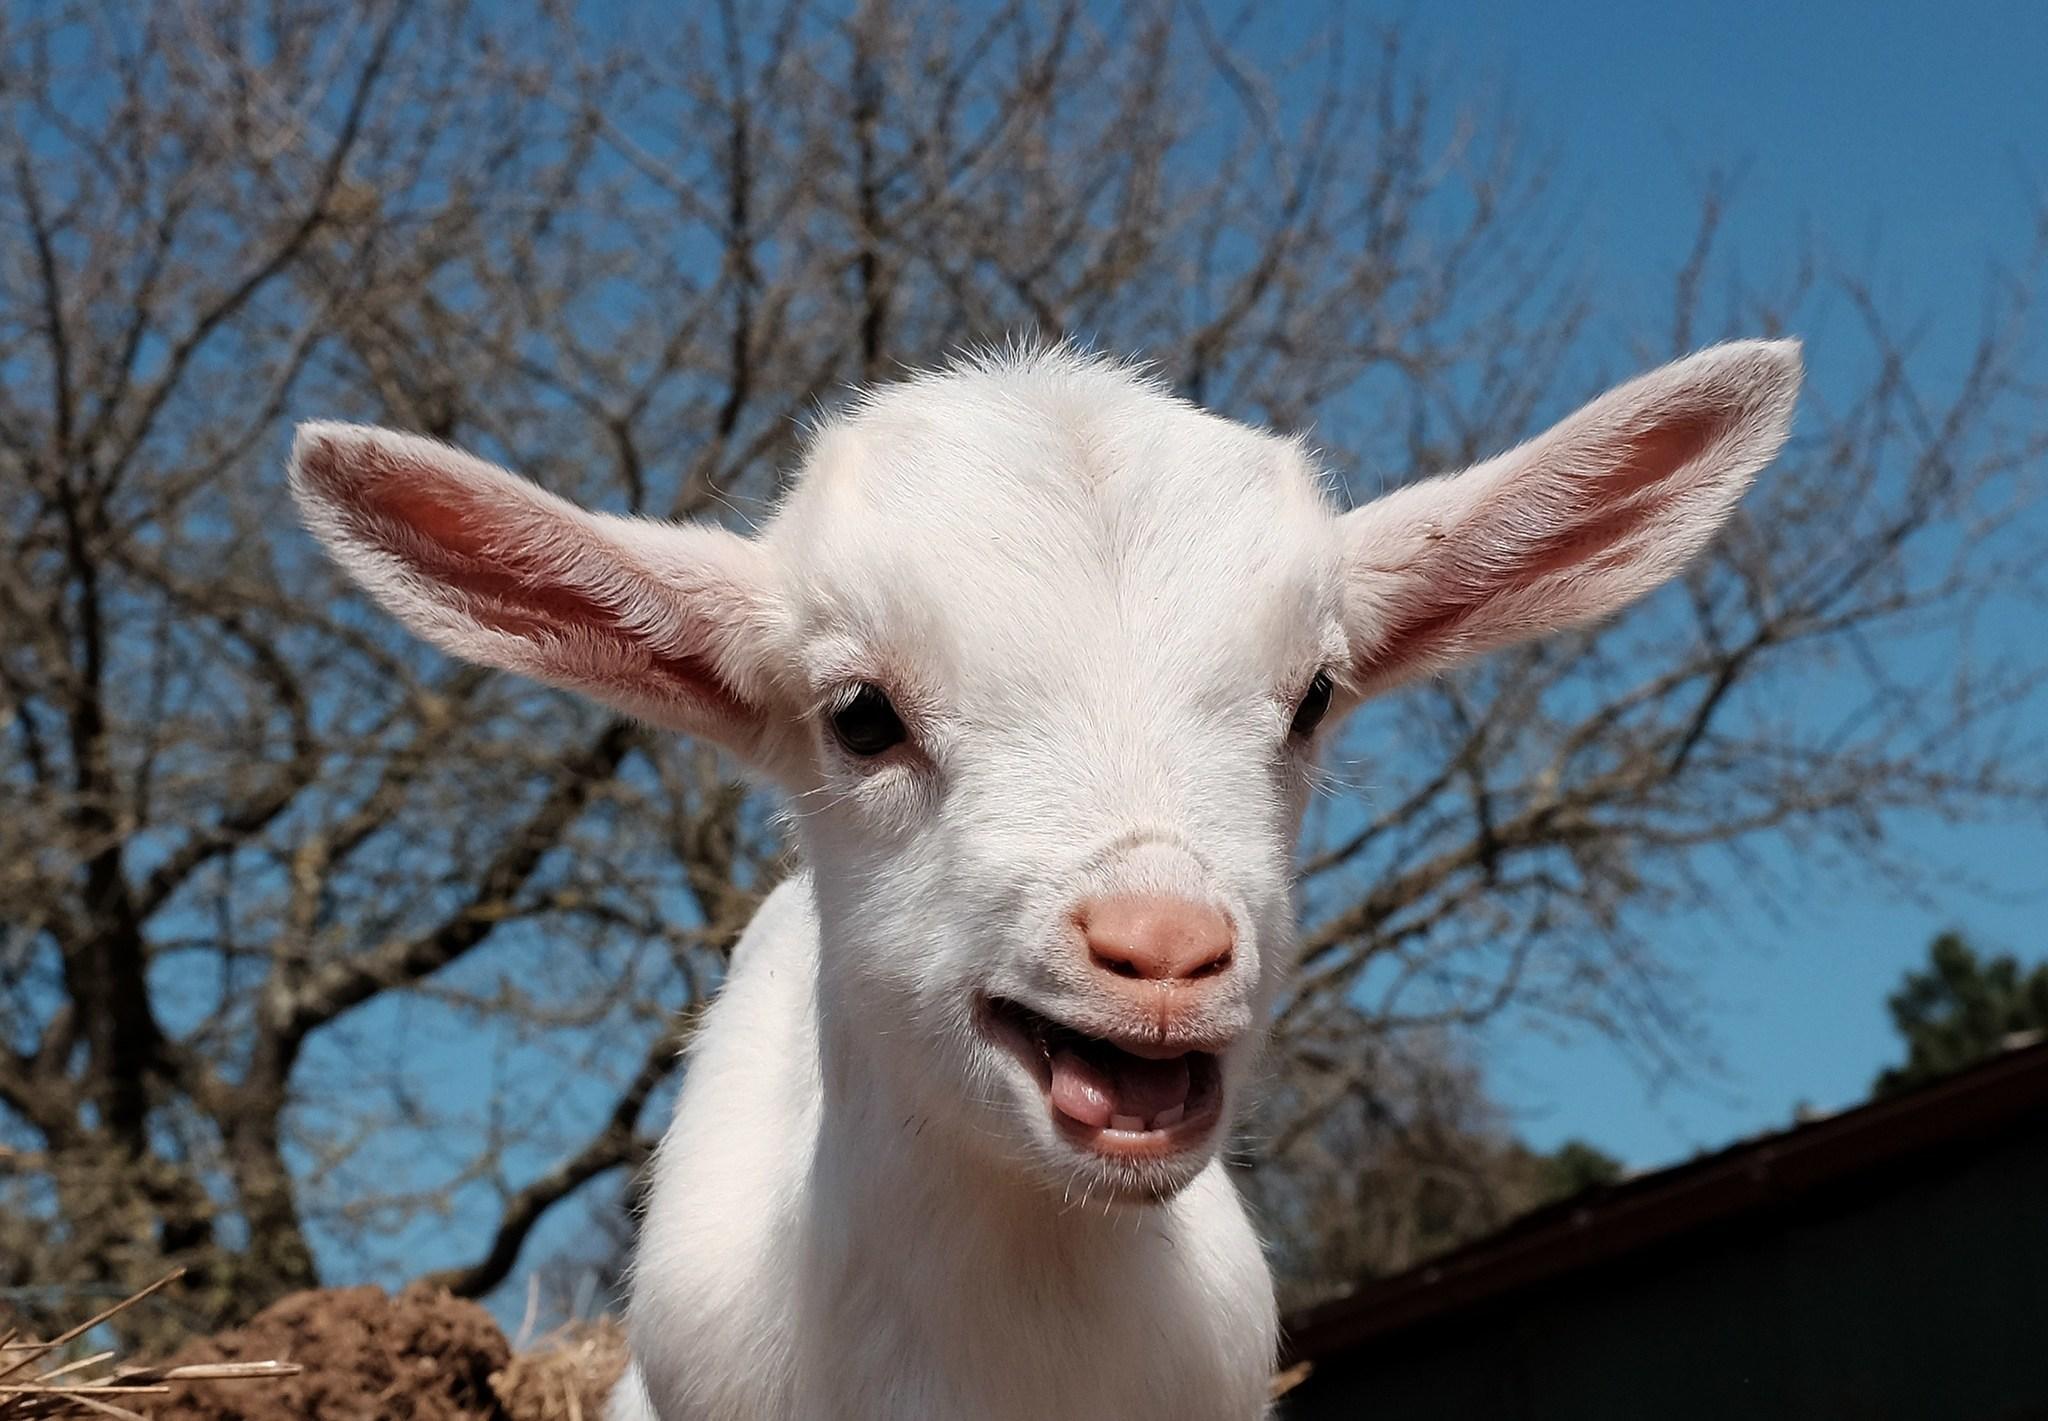 goat - photo #32